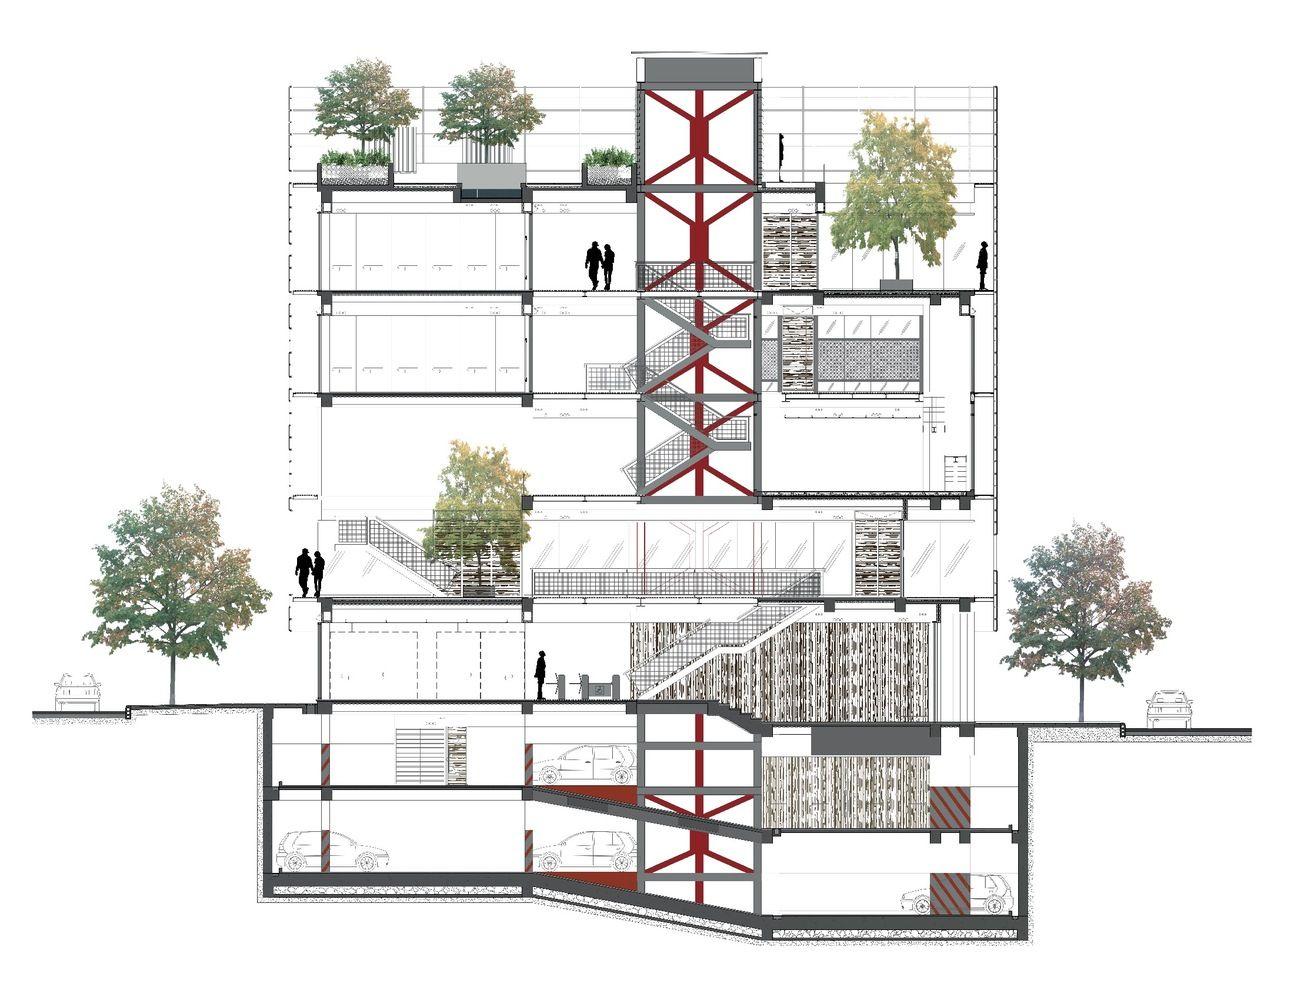 M s de 25 ideas incre bles sobre colegio arquitectos en for Arquitectura de interiores a distancia